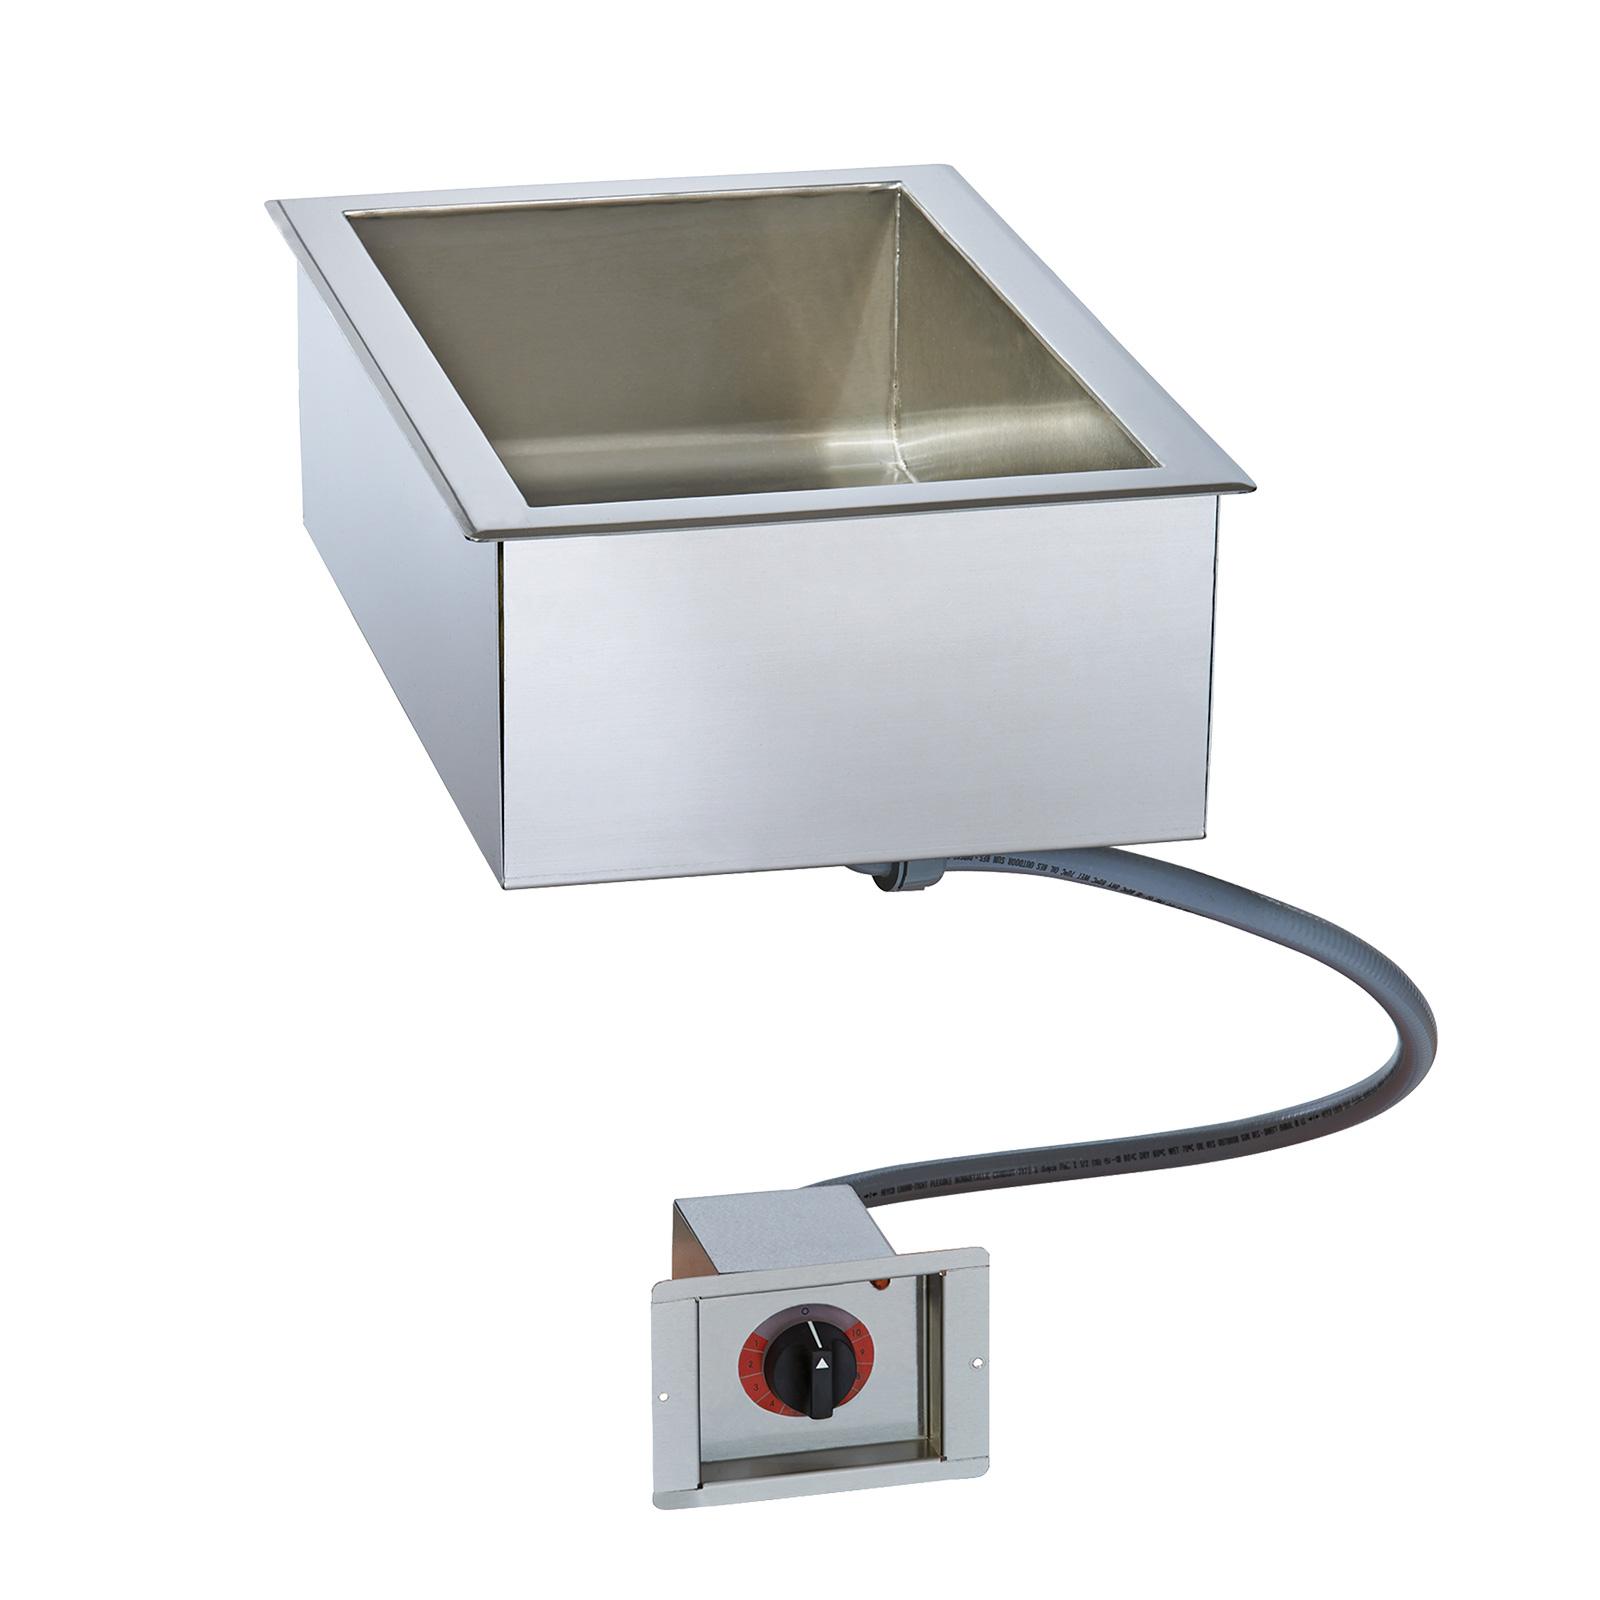 Alto-Shaam 100-HW/D6-QS hot food well unit, drop-in, electric